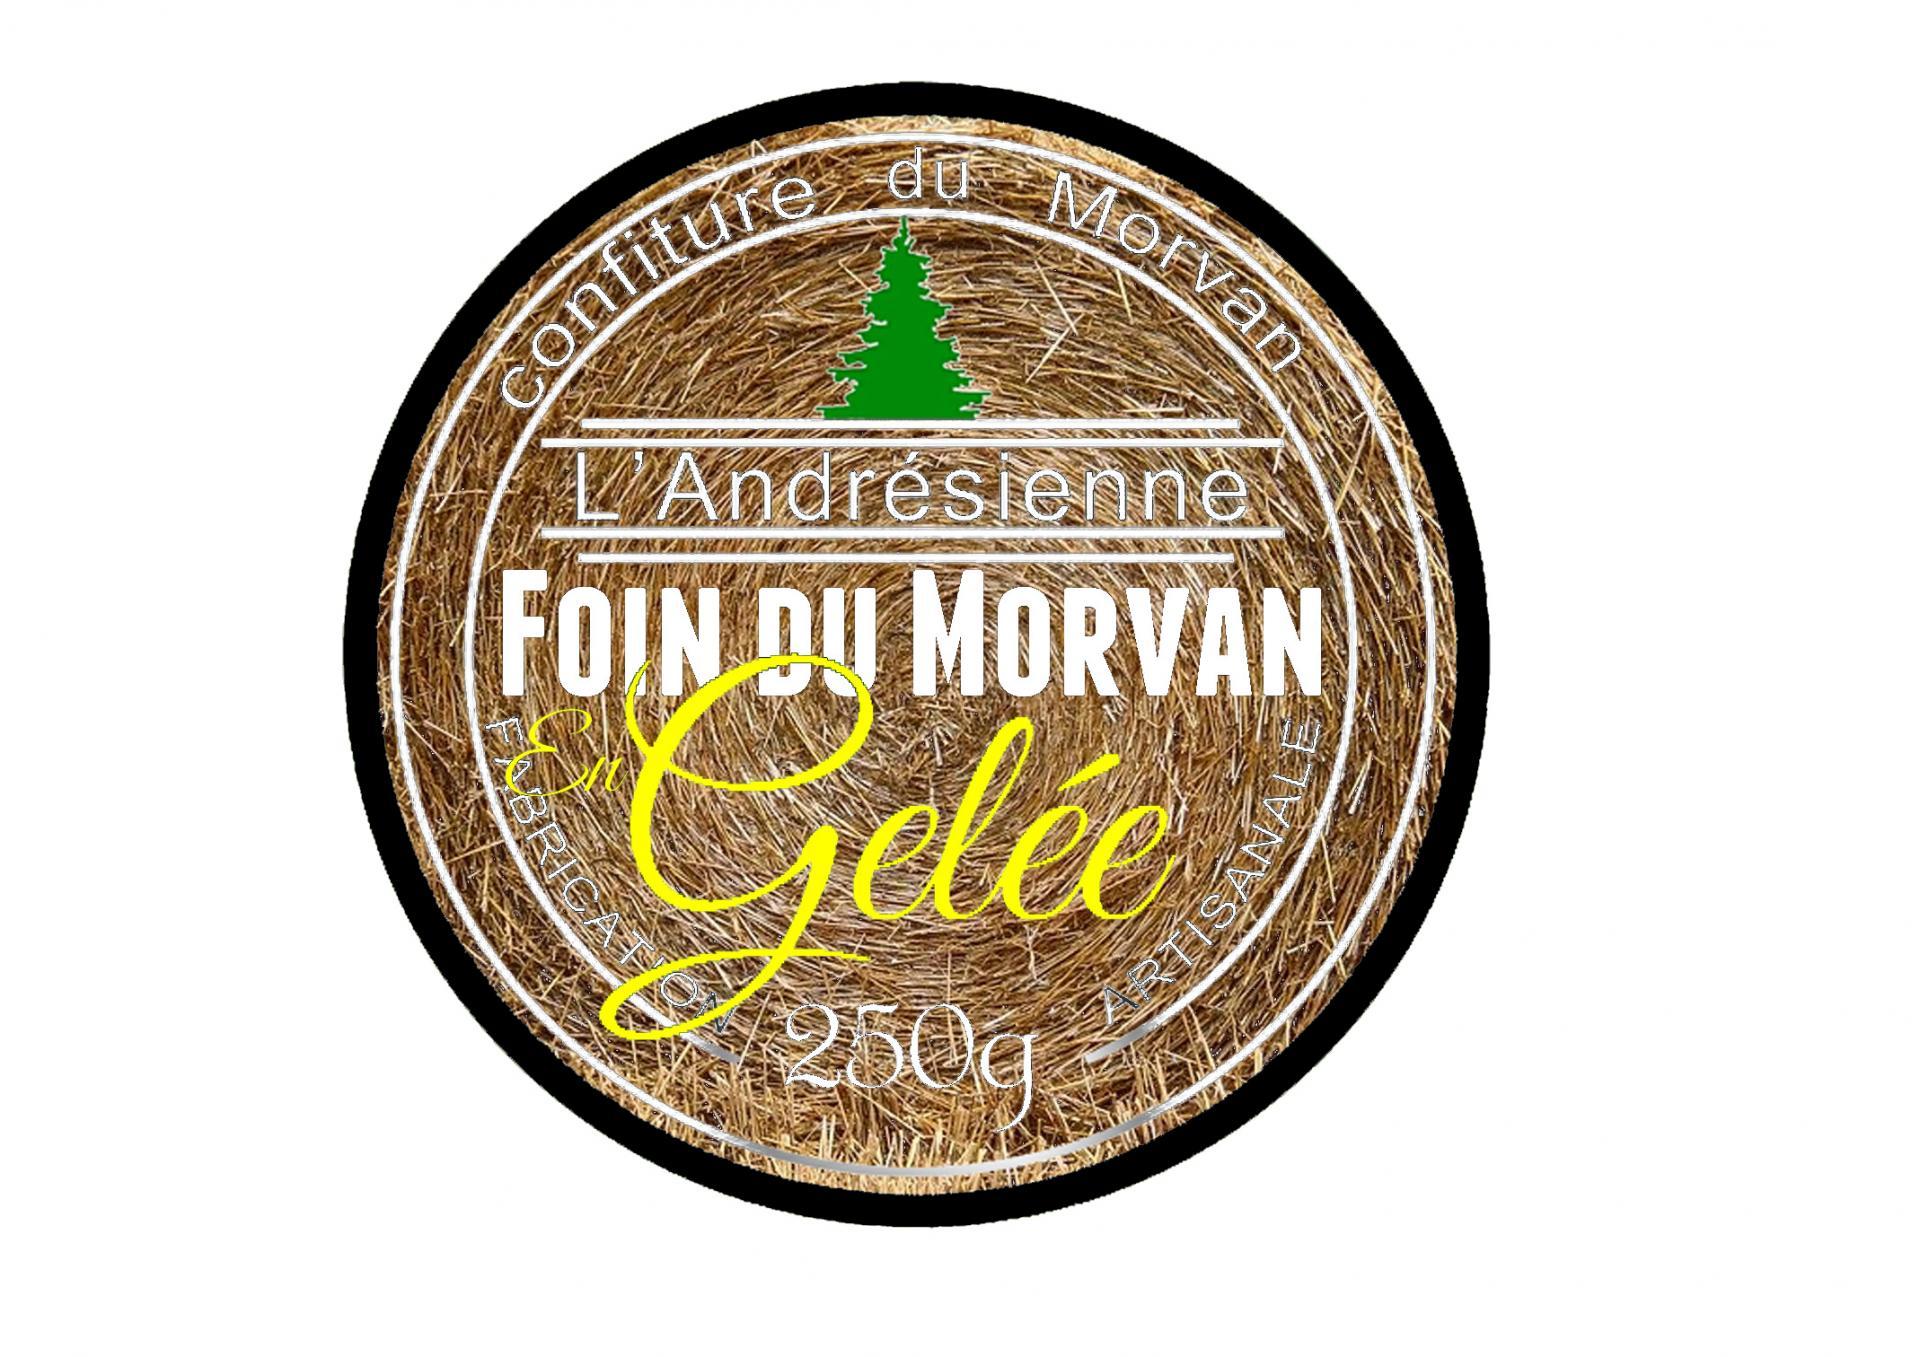 Foin du morvan photo web